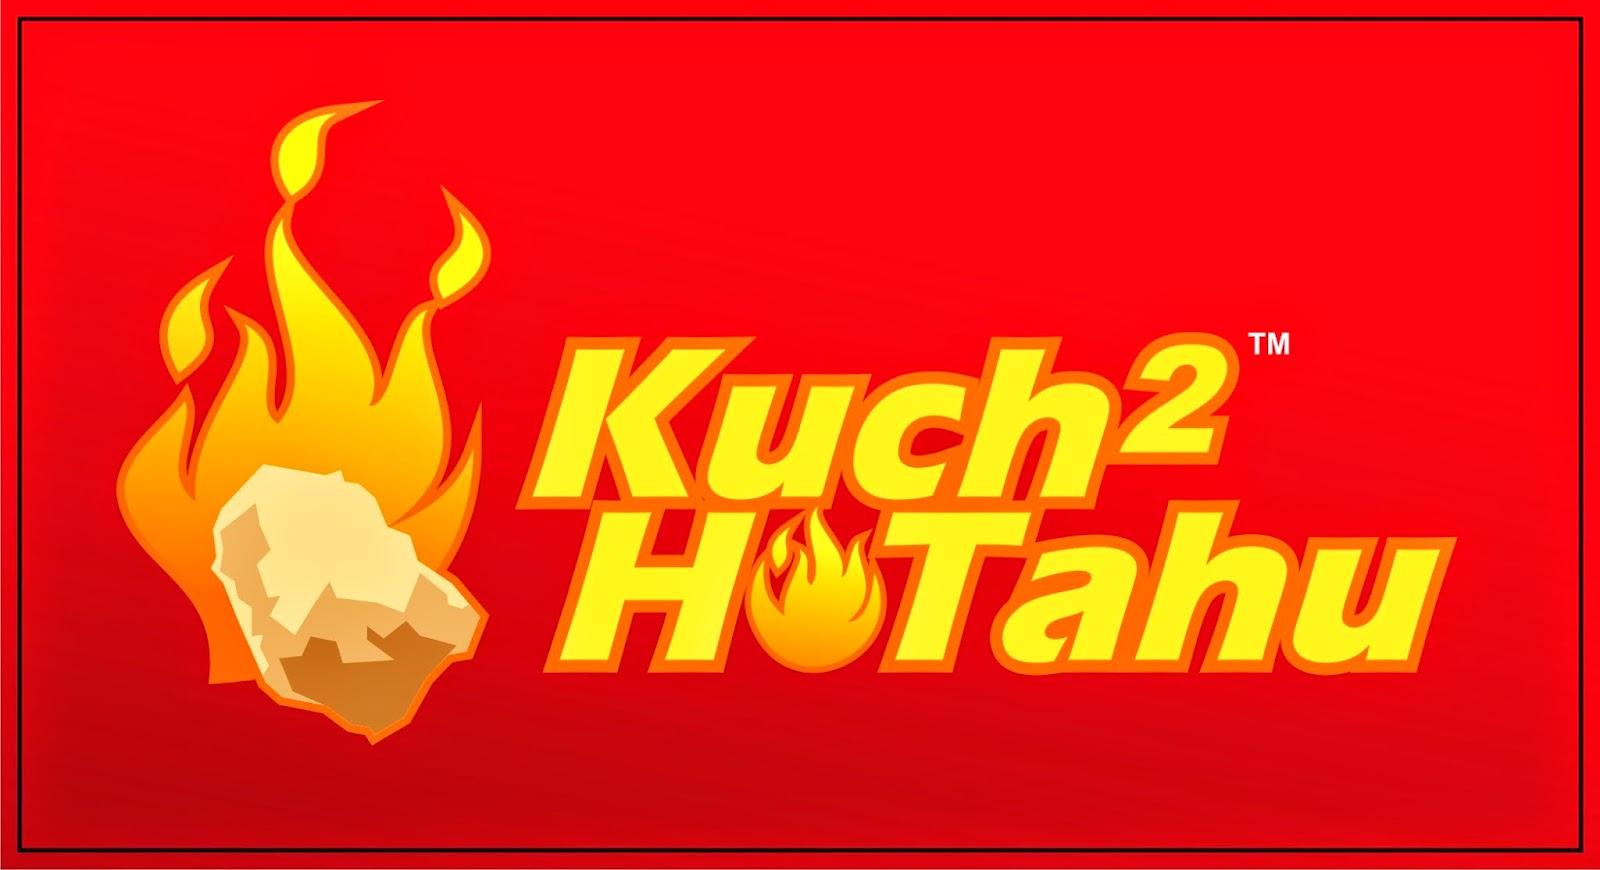 Lowongan Kerja di Kuch2hotahu – Kudus (Admin, Supervisor, Marketing Manager)